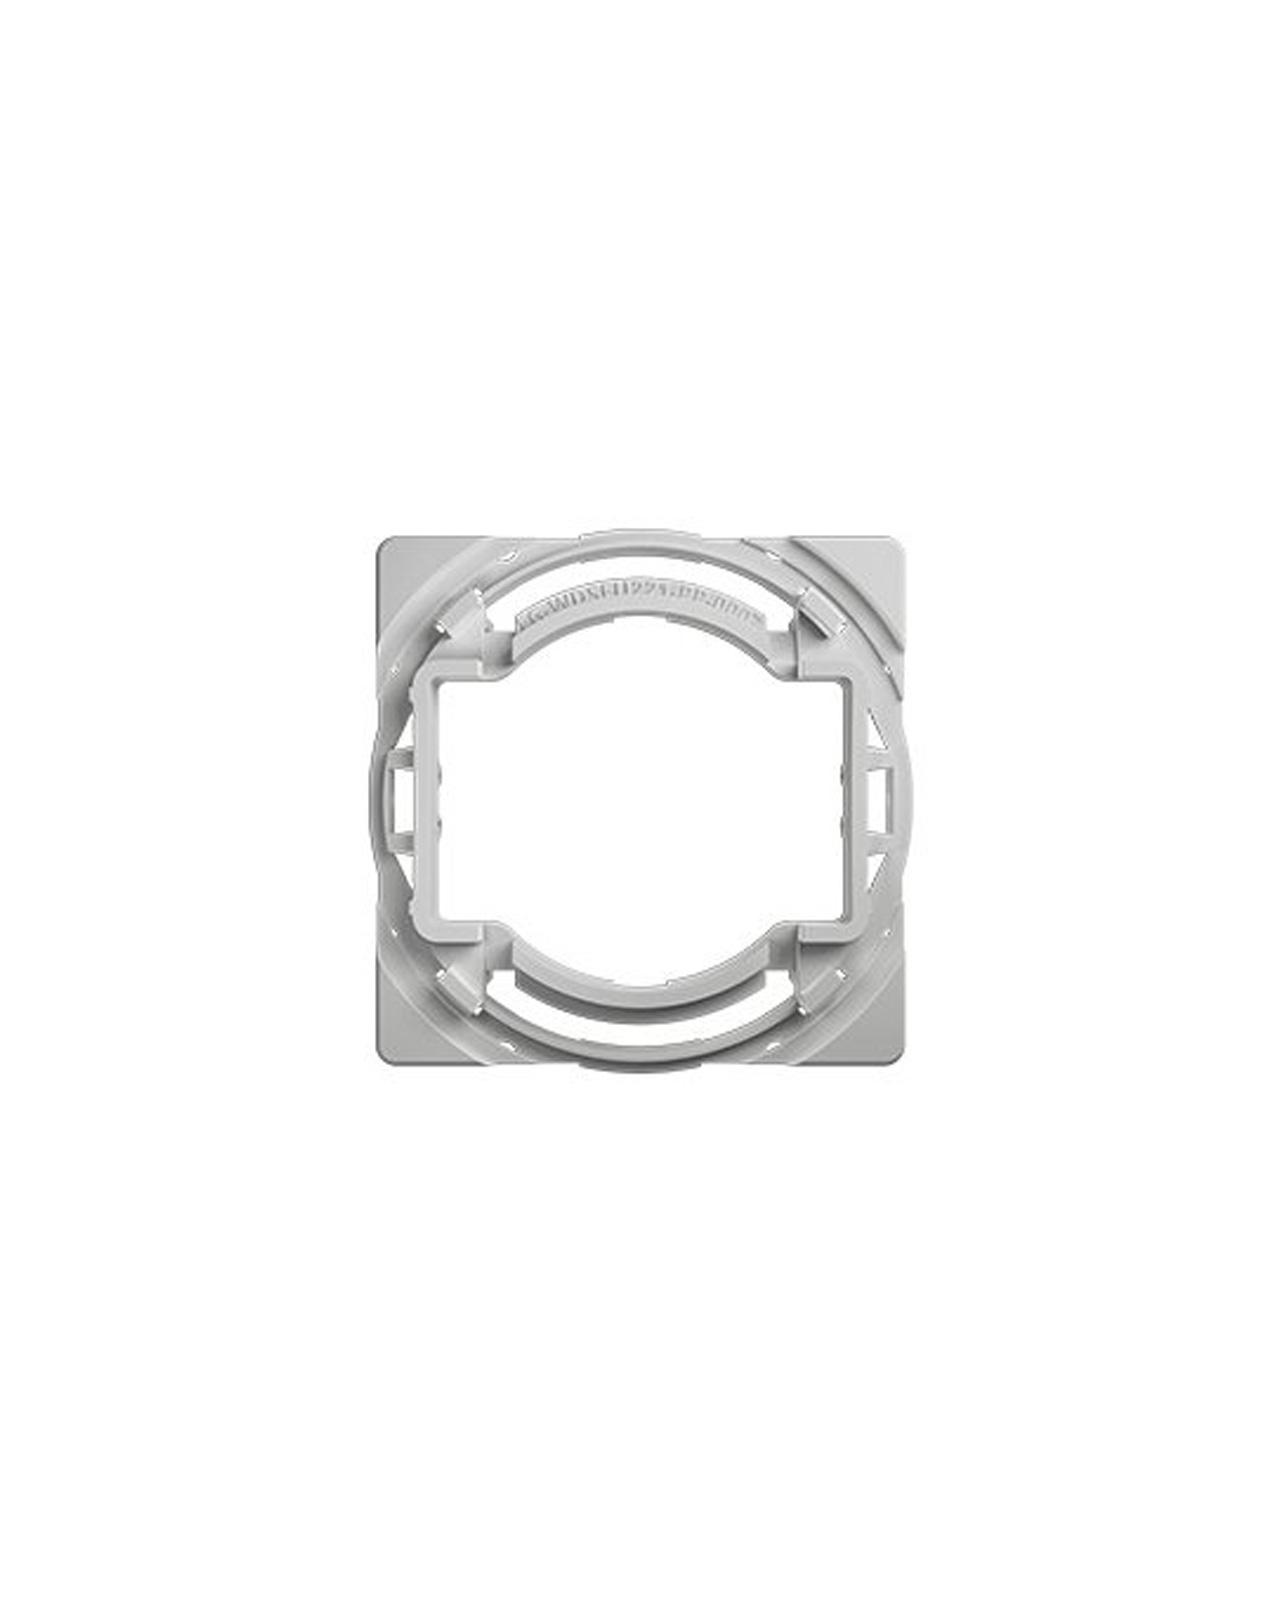 fibaro-switch-button-adapter-legrand-gira